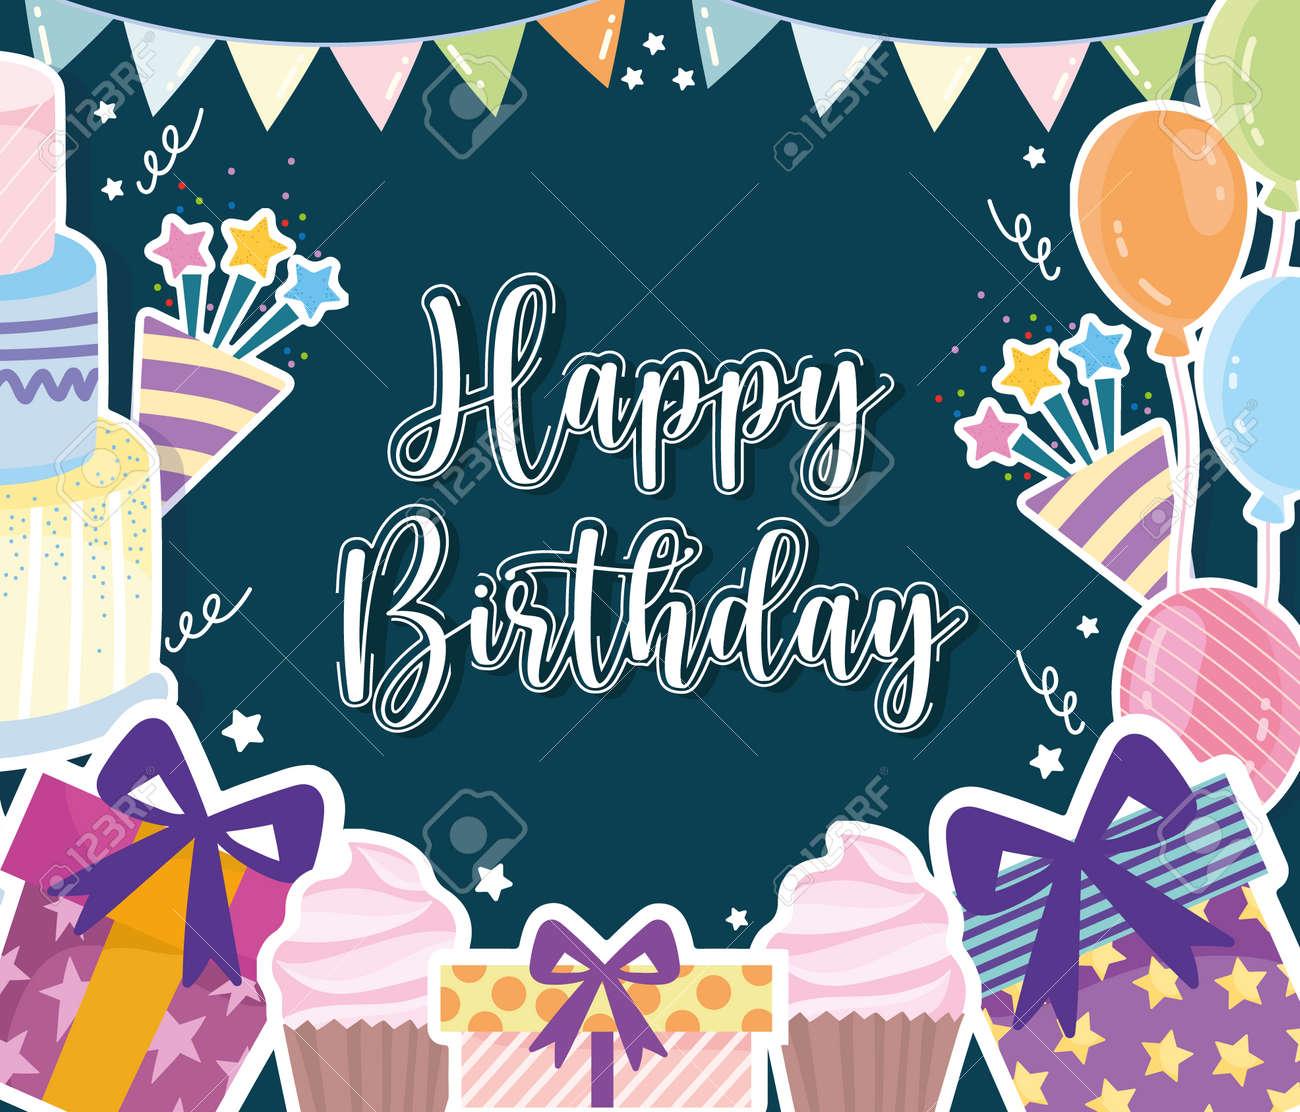 Birthday celebration party festive card - 165102378